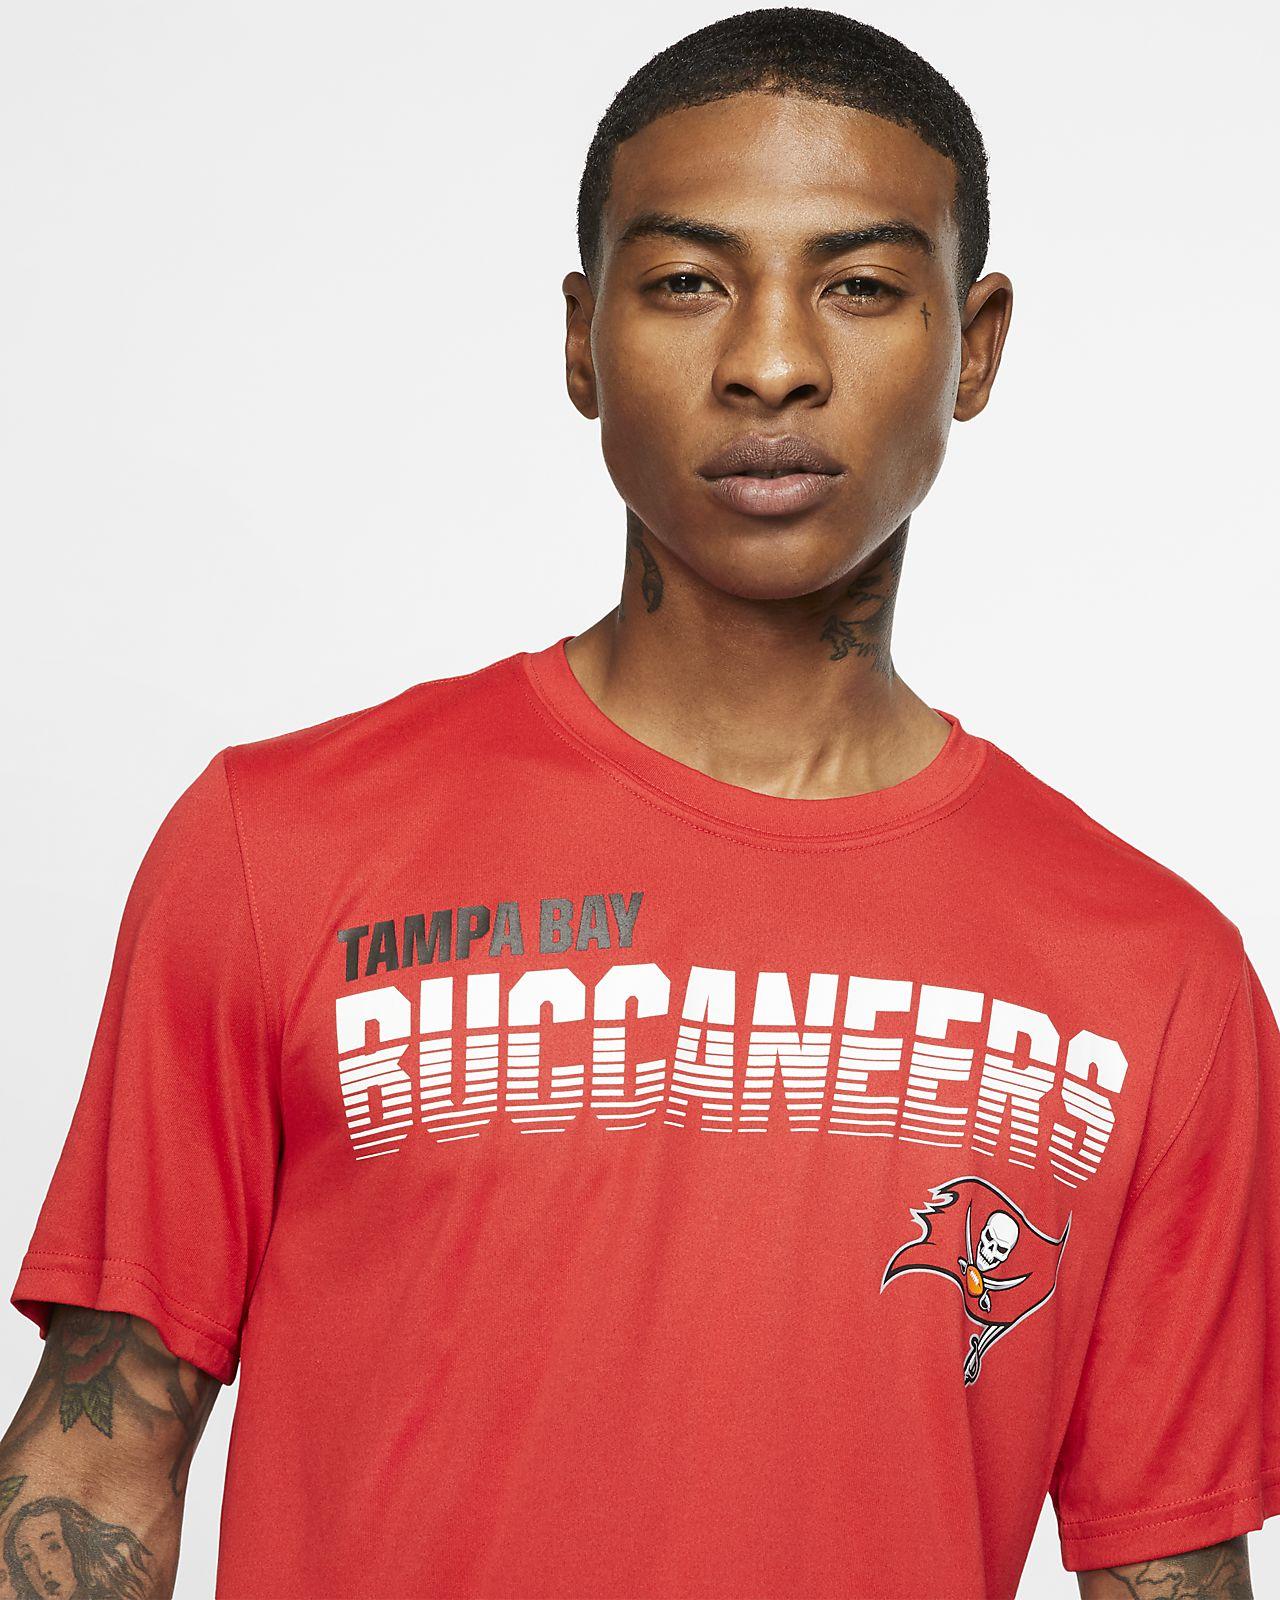 nike buccaneers shirt